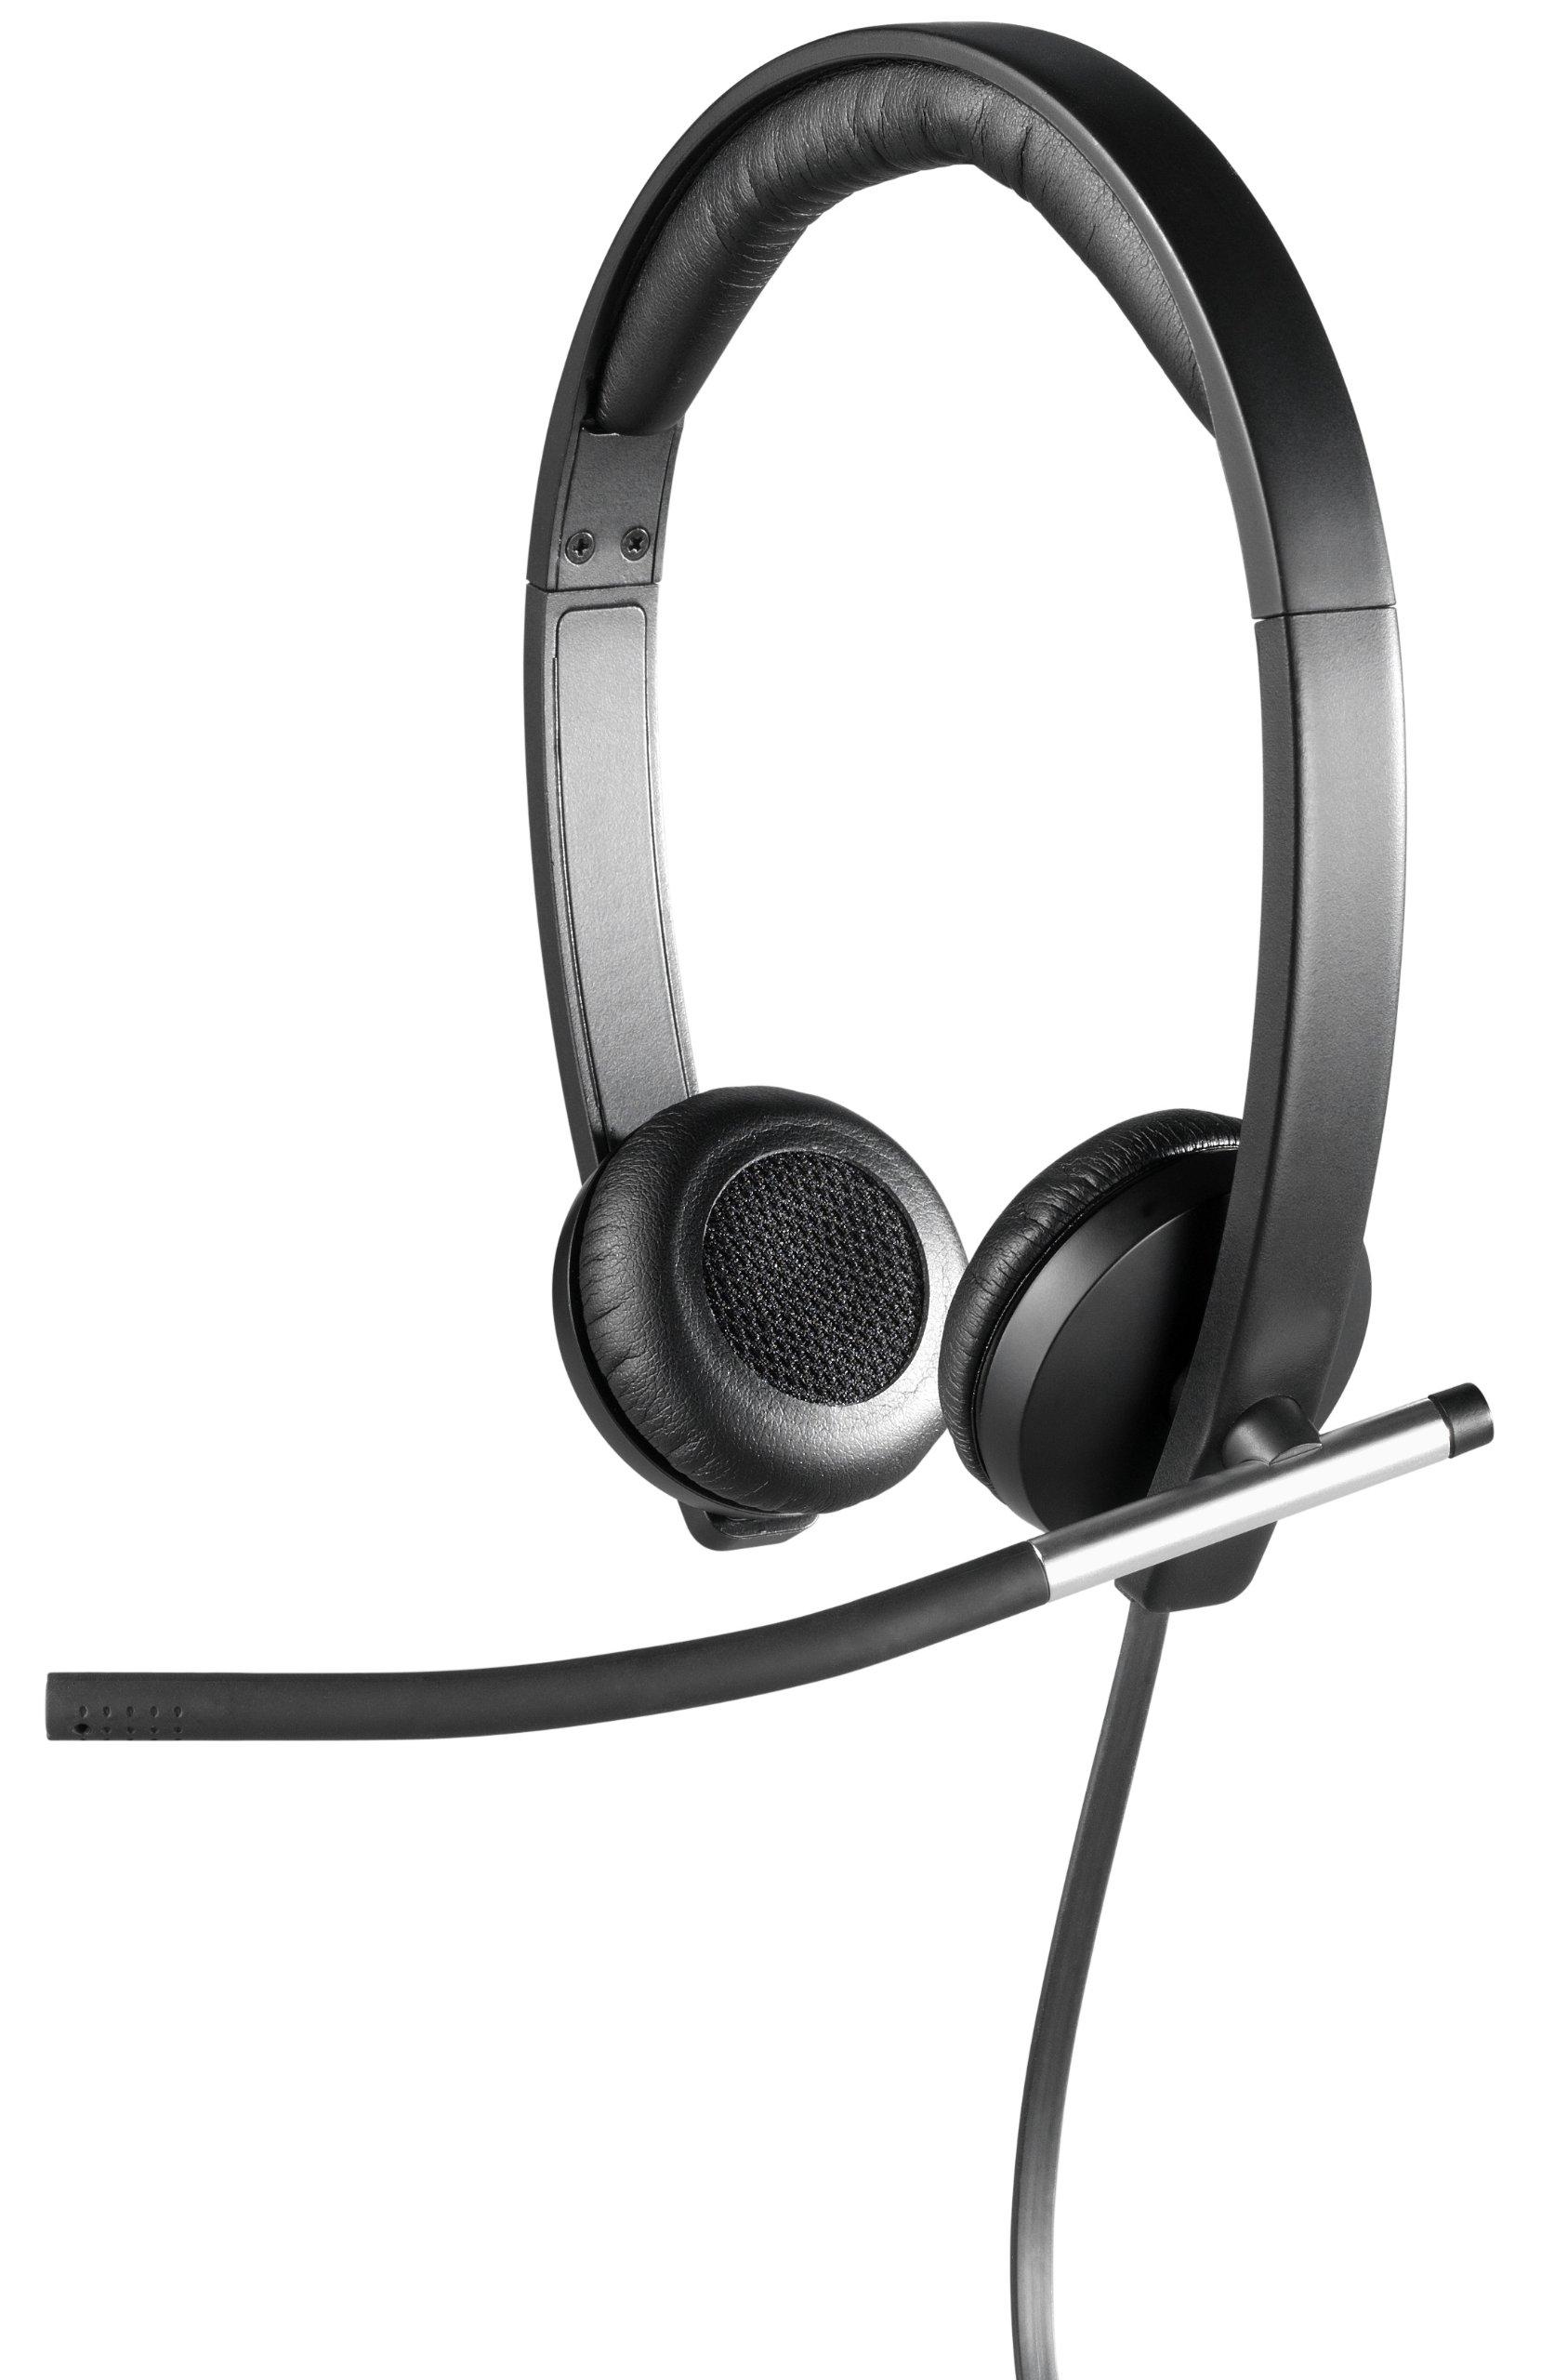 Auriculares Logitech USB Headset Stereo H650e